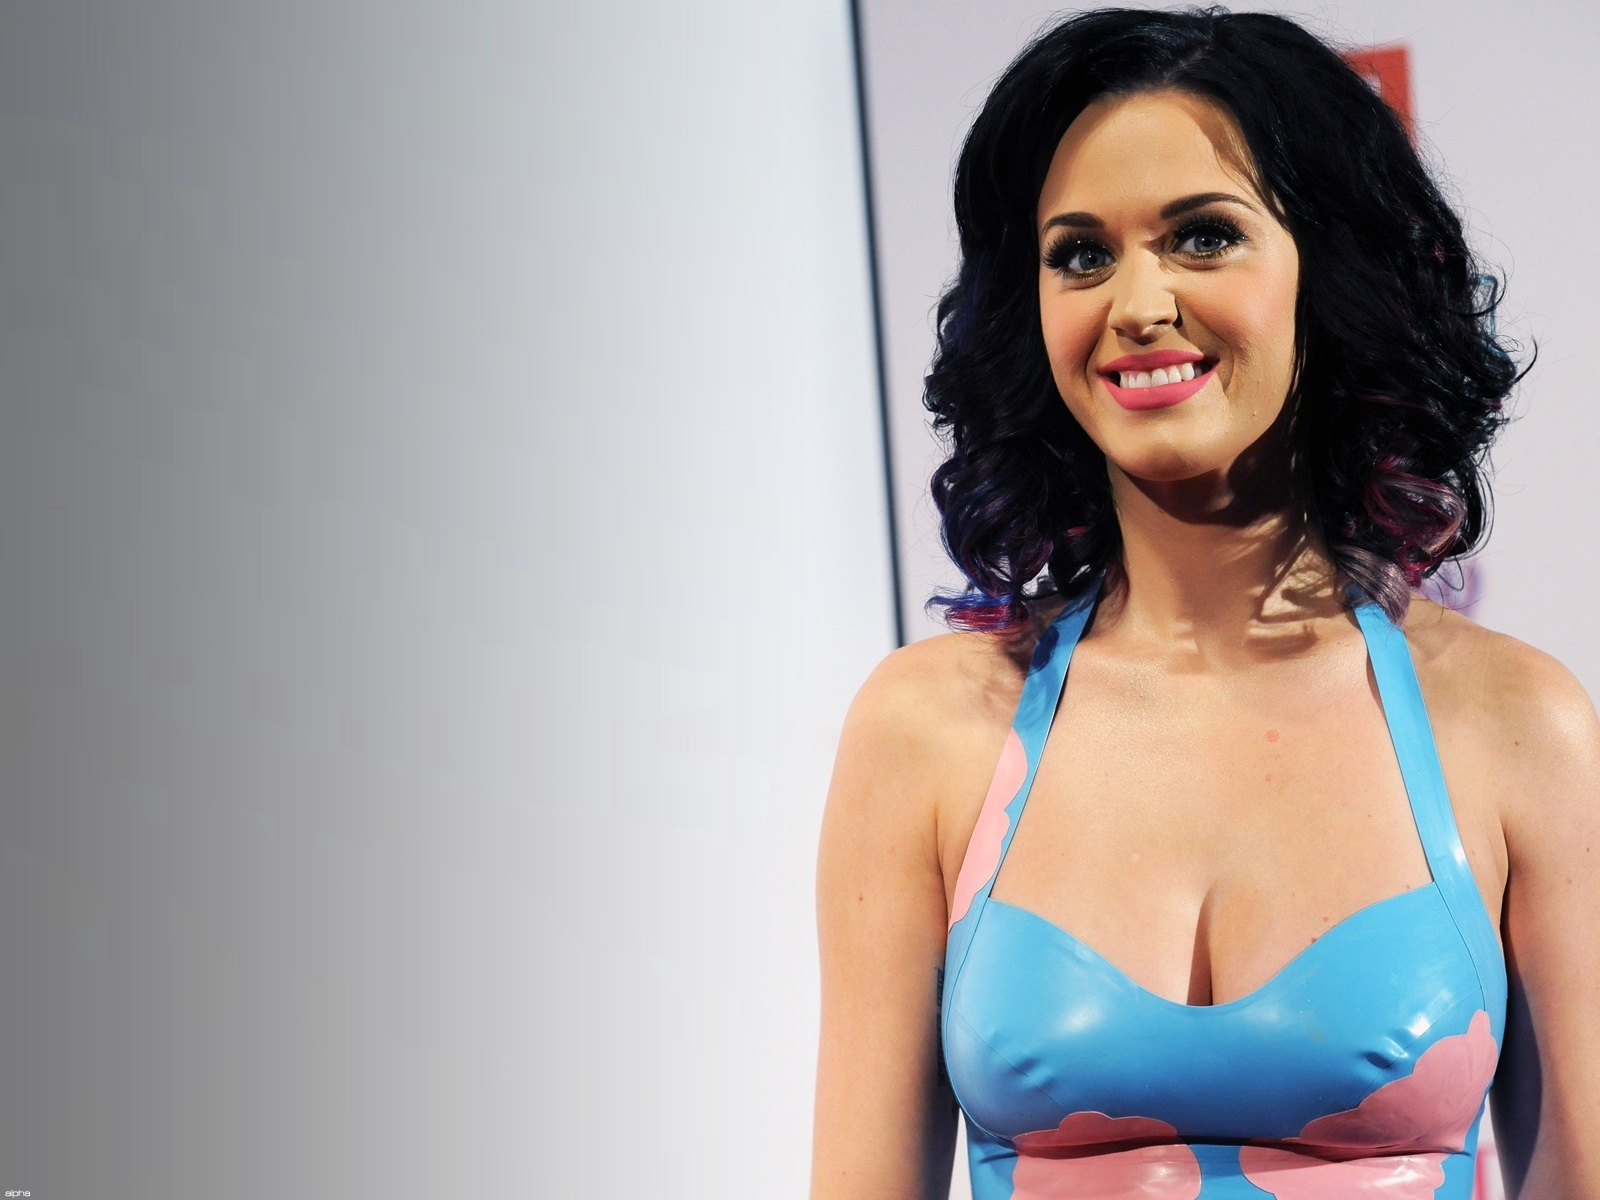 Wallpaper Girls Tatto Hd Katy Perry Katy Perry Wallpaper 16409082 Fanpop